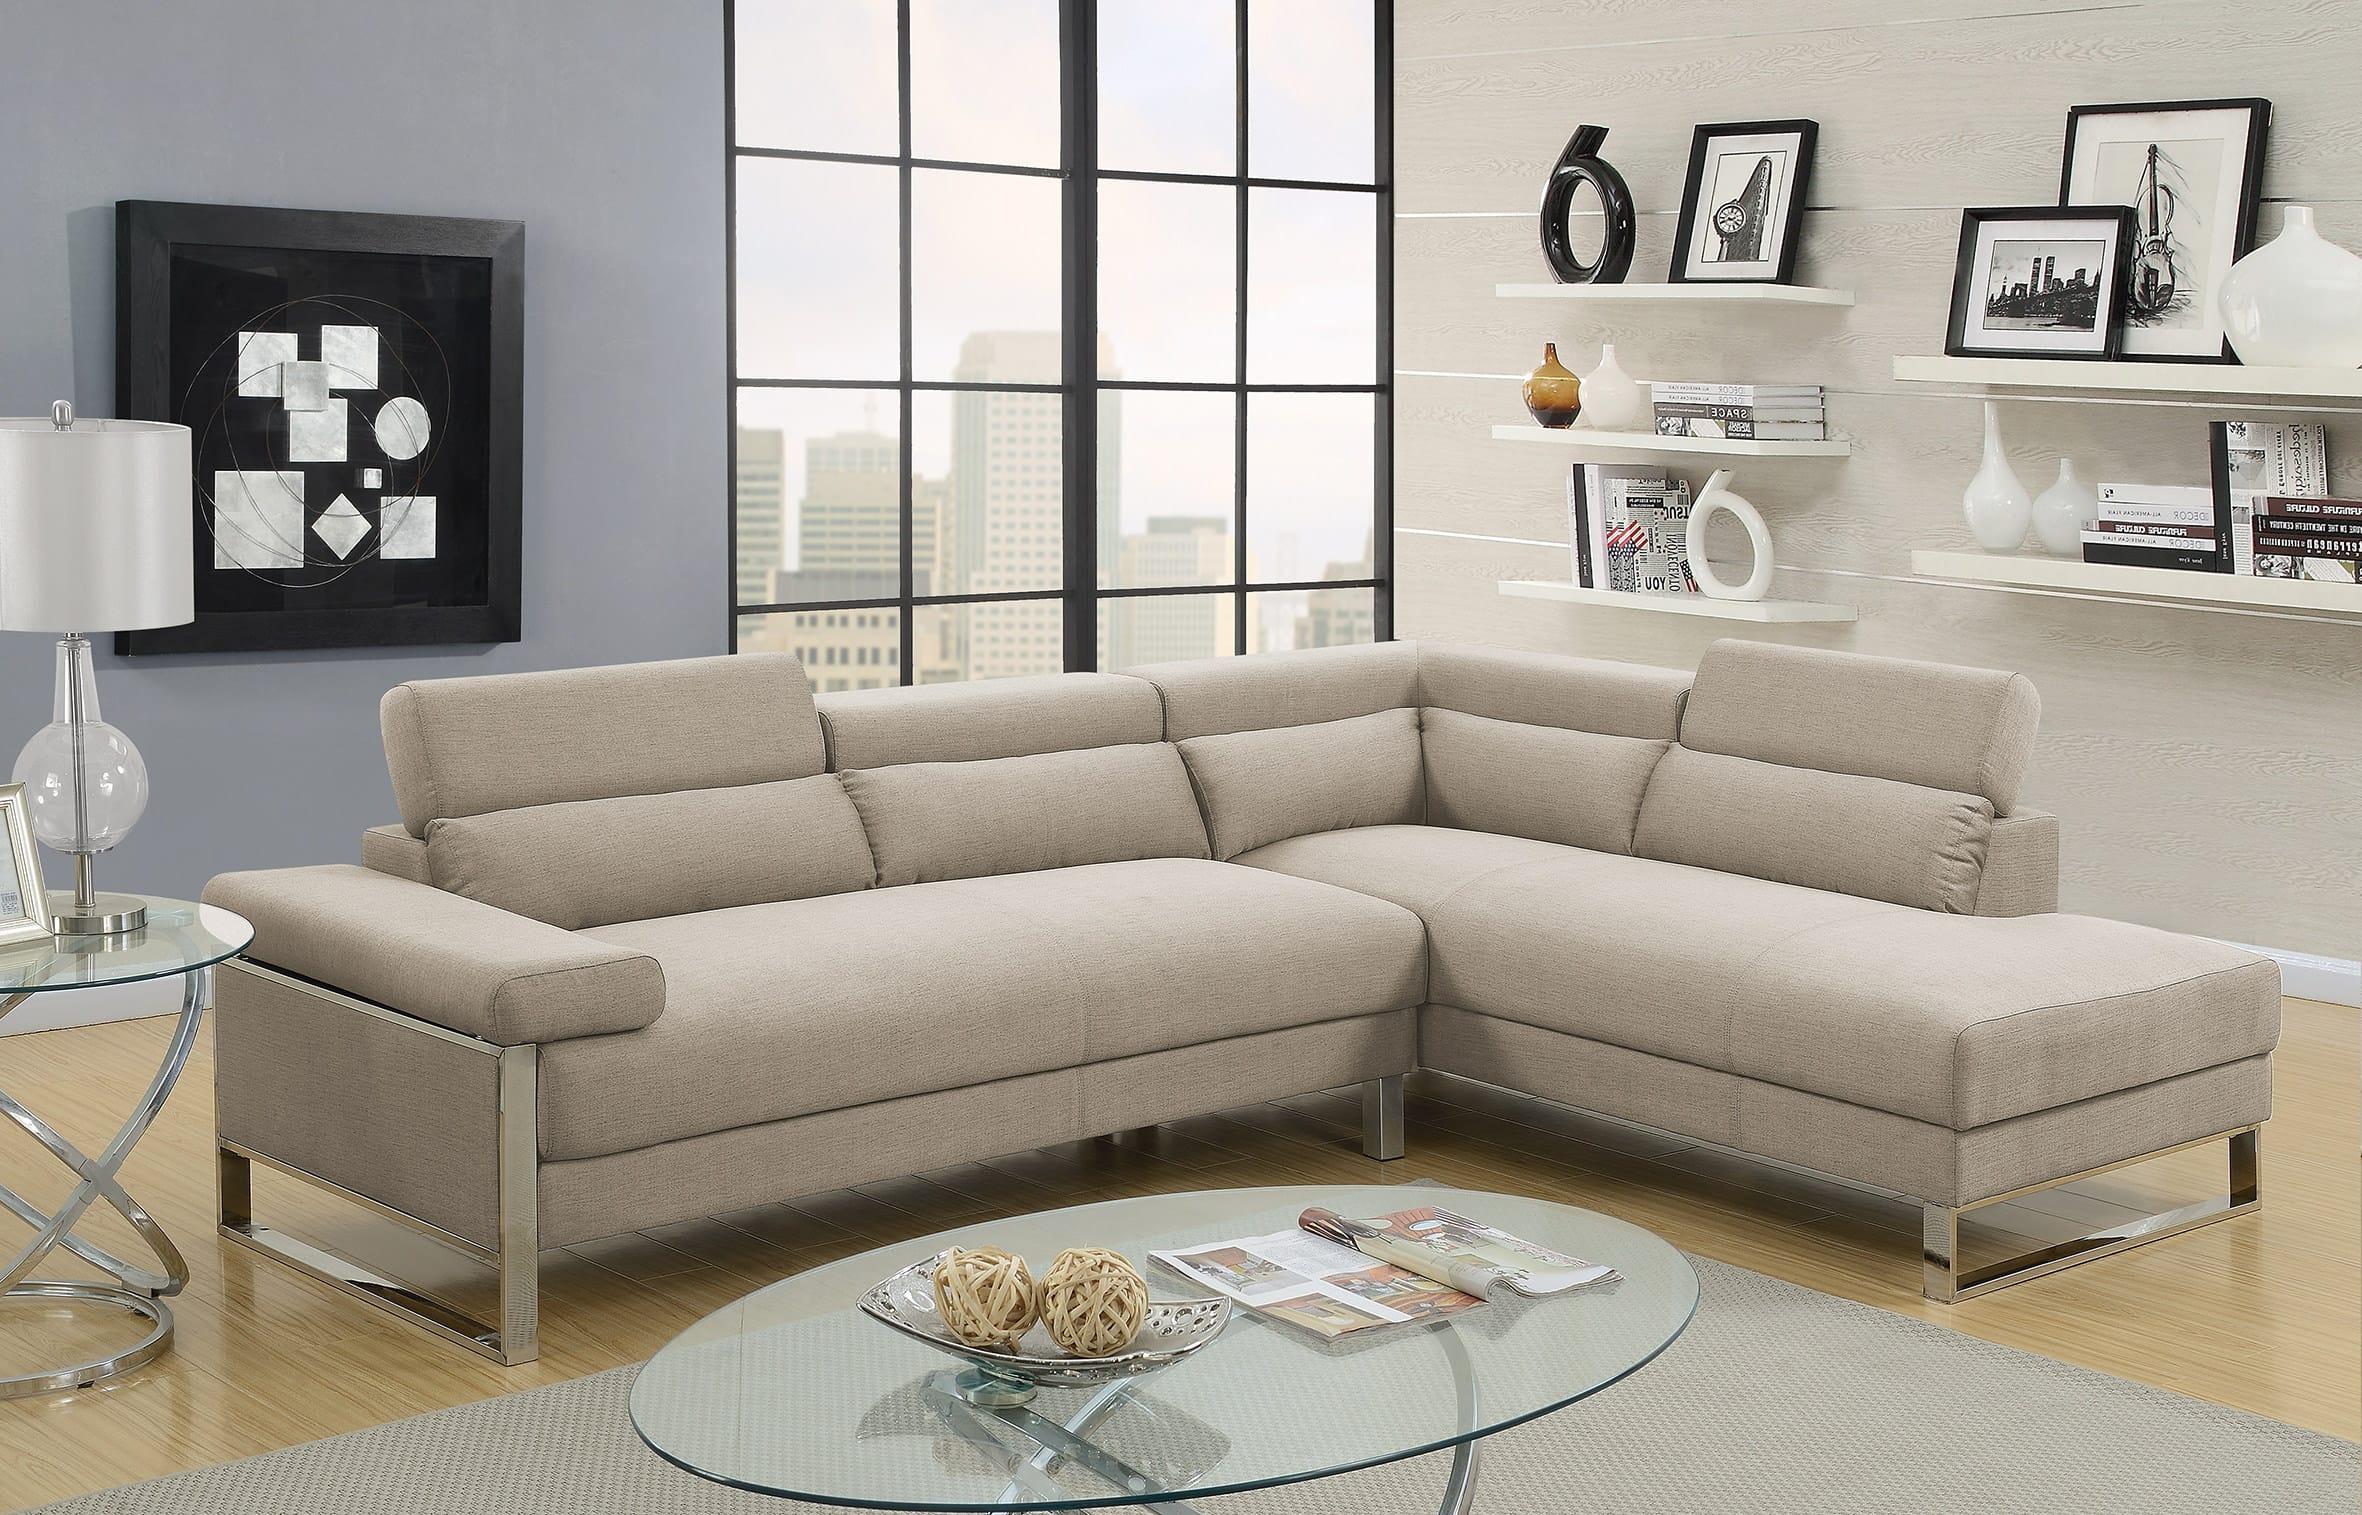 F6540 Beige 2 Pcs Sectional Sofa Set By Poundex